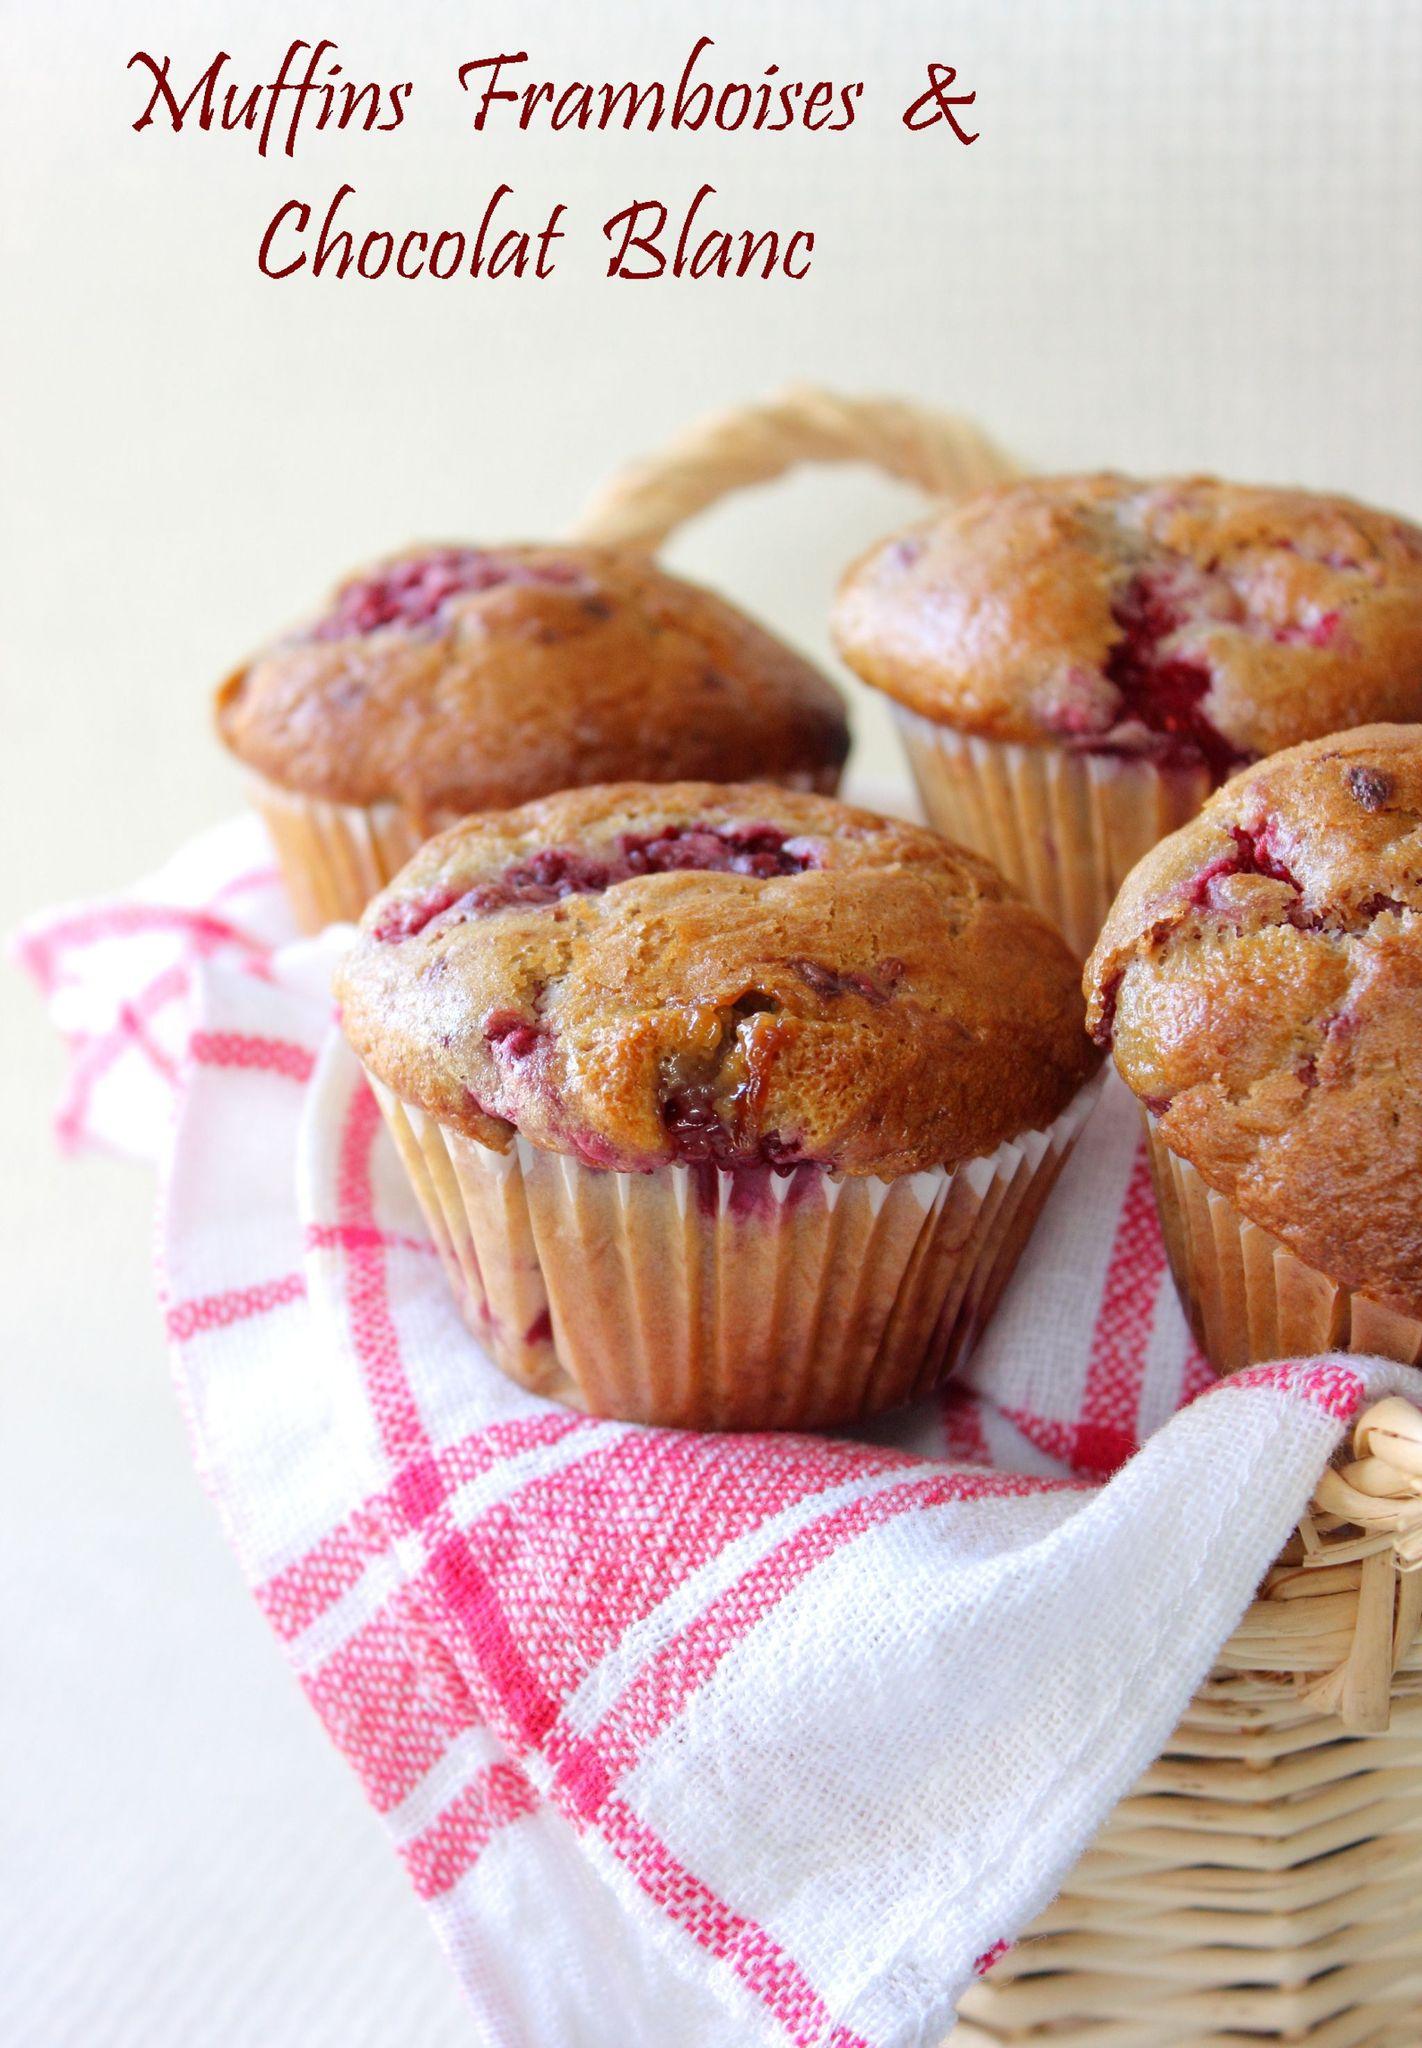 Muffins Framboises & Chocolat Blanc copie